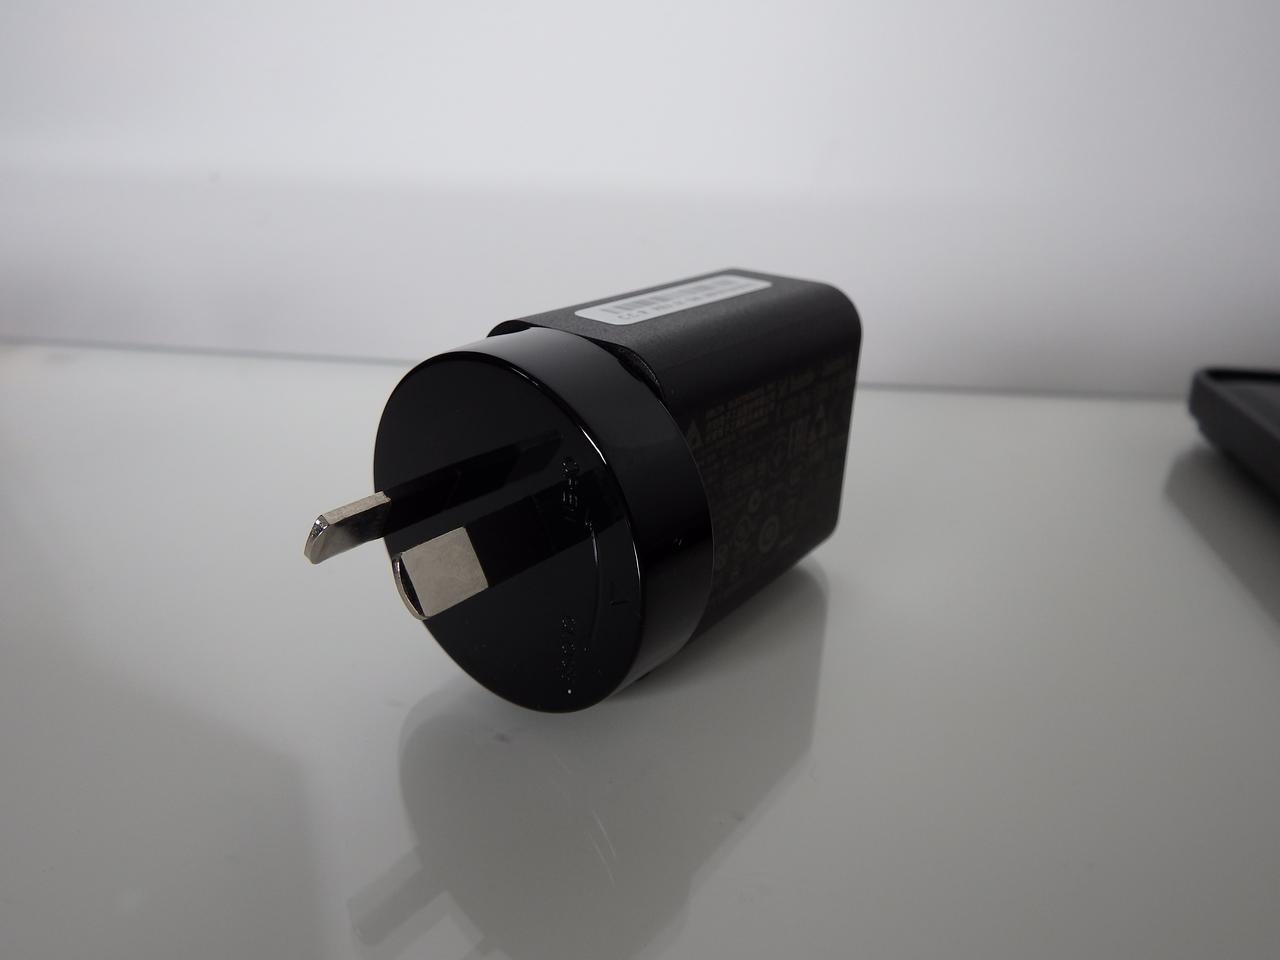 P1230058